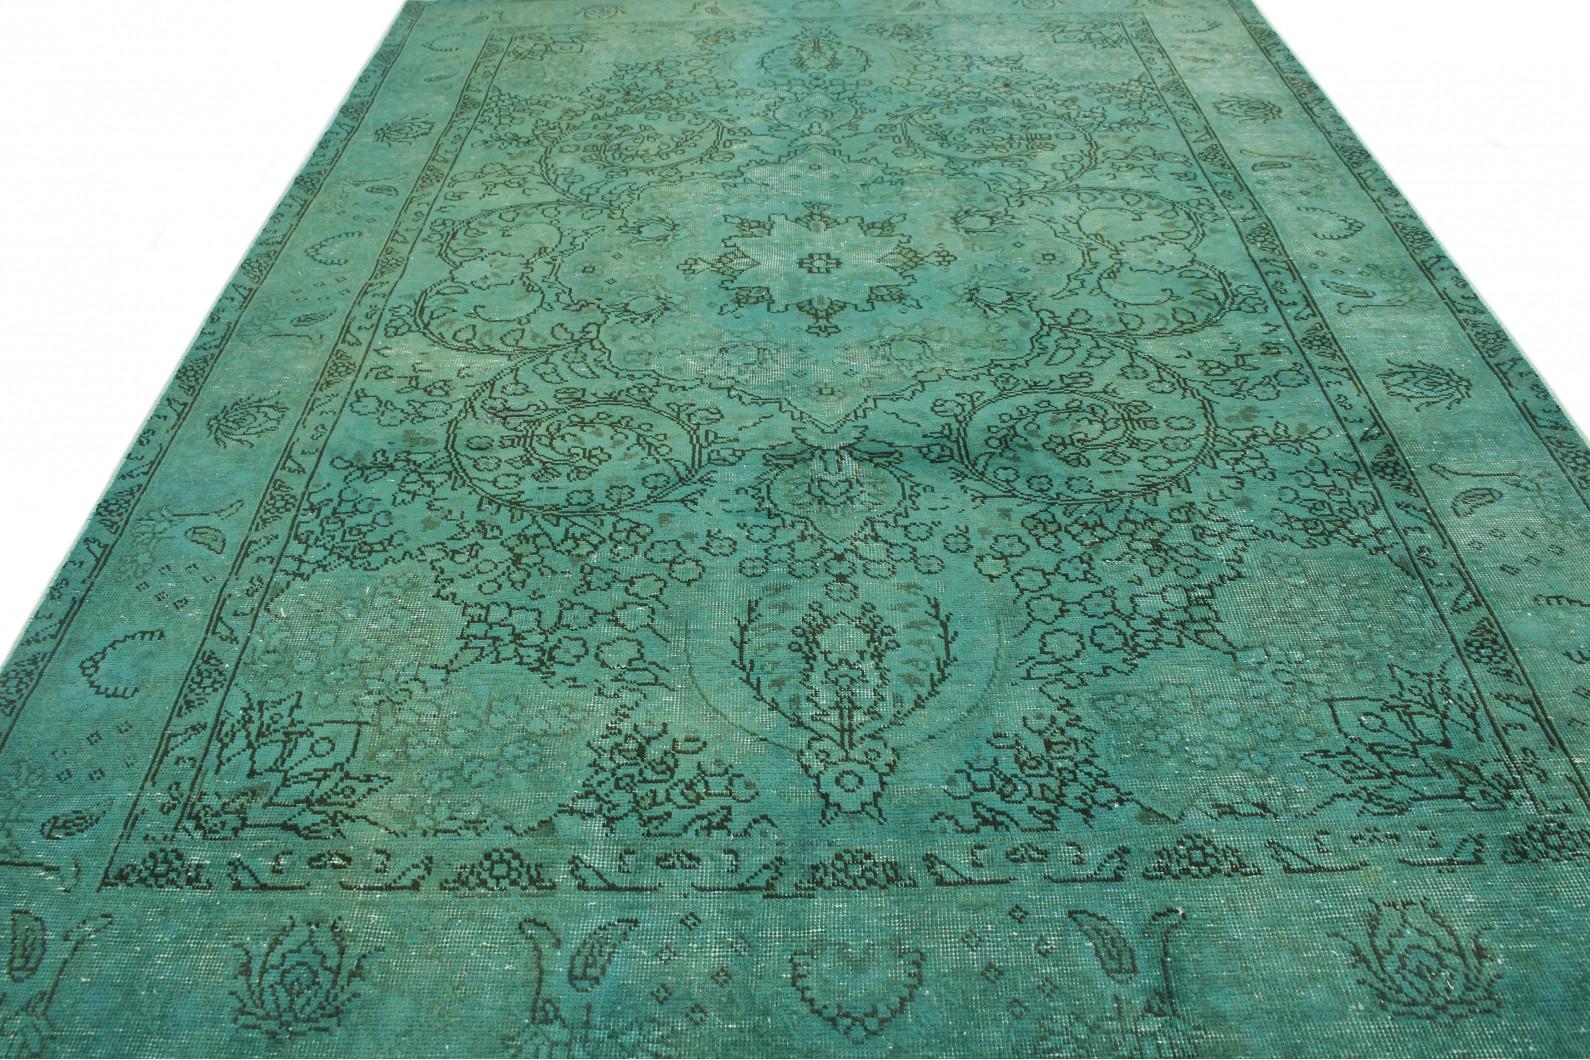 vintage teppich gr n t rkis in 290x200 1001 3712 bei kaufen. Black Bedroom Furniture Sets. Home Design Ideas